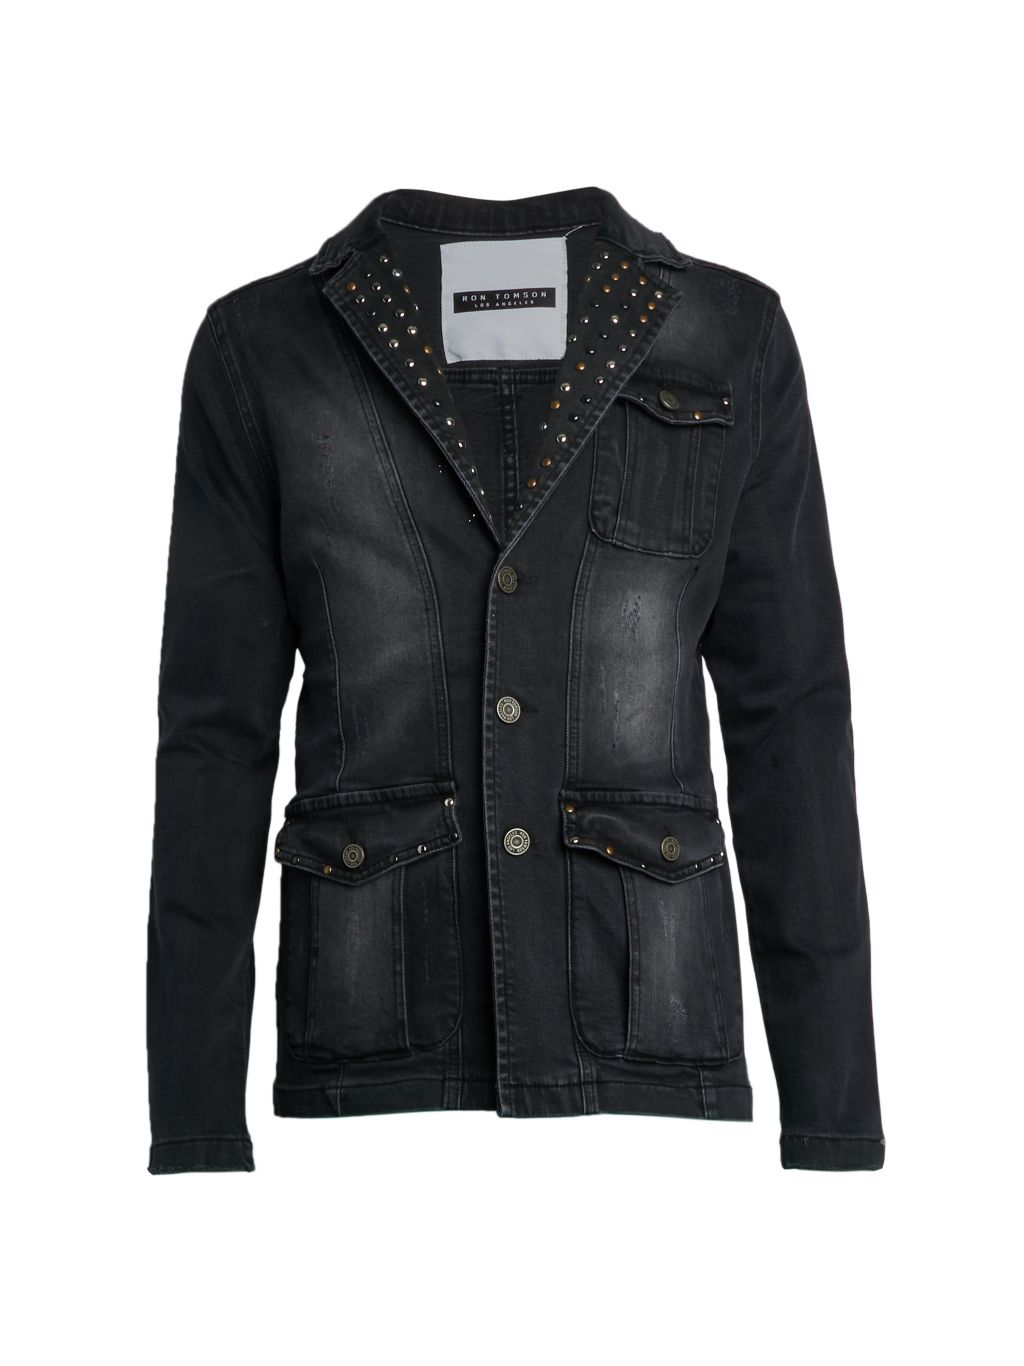 RON TOMSON Artist Studded Denim Jacket